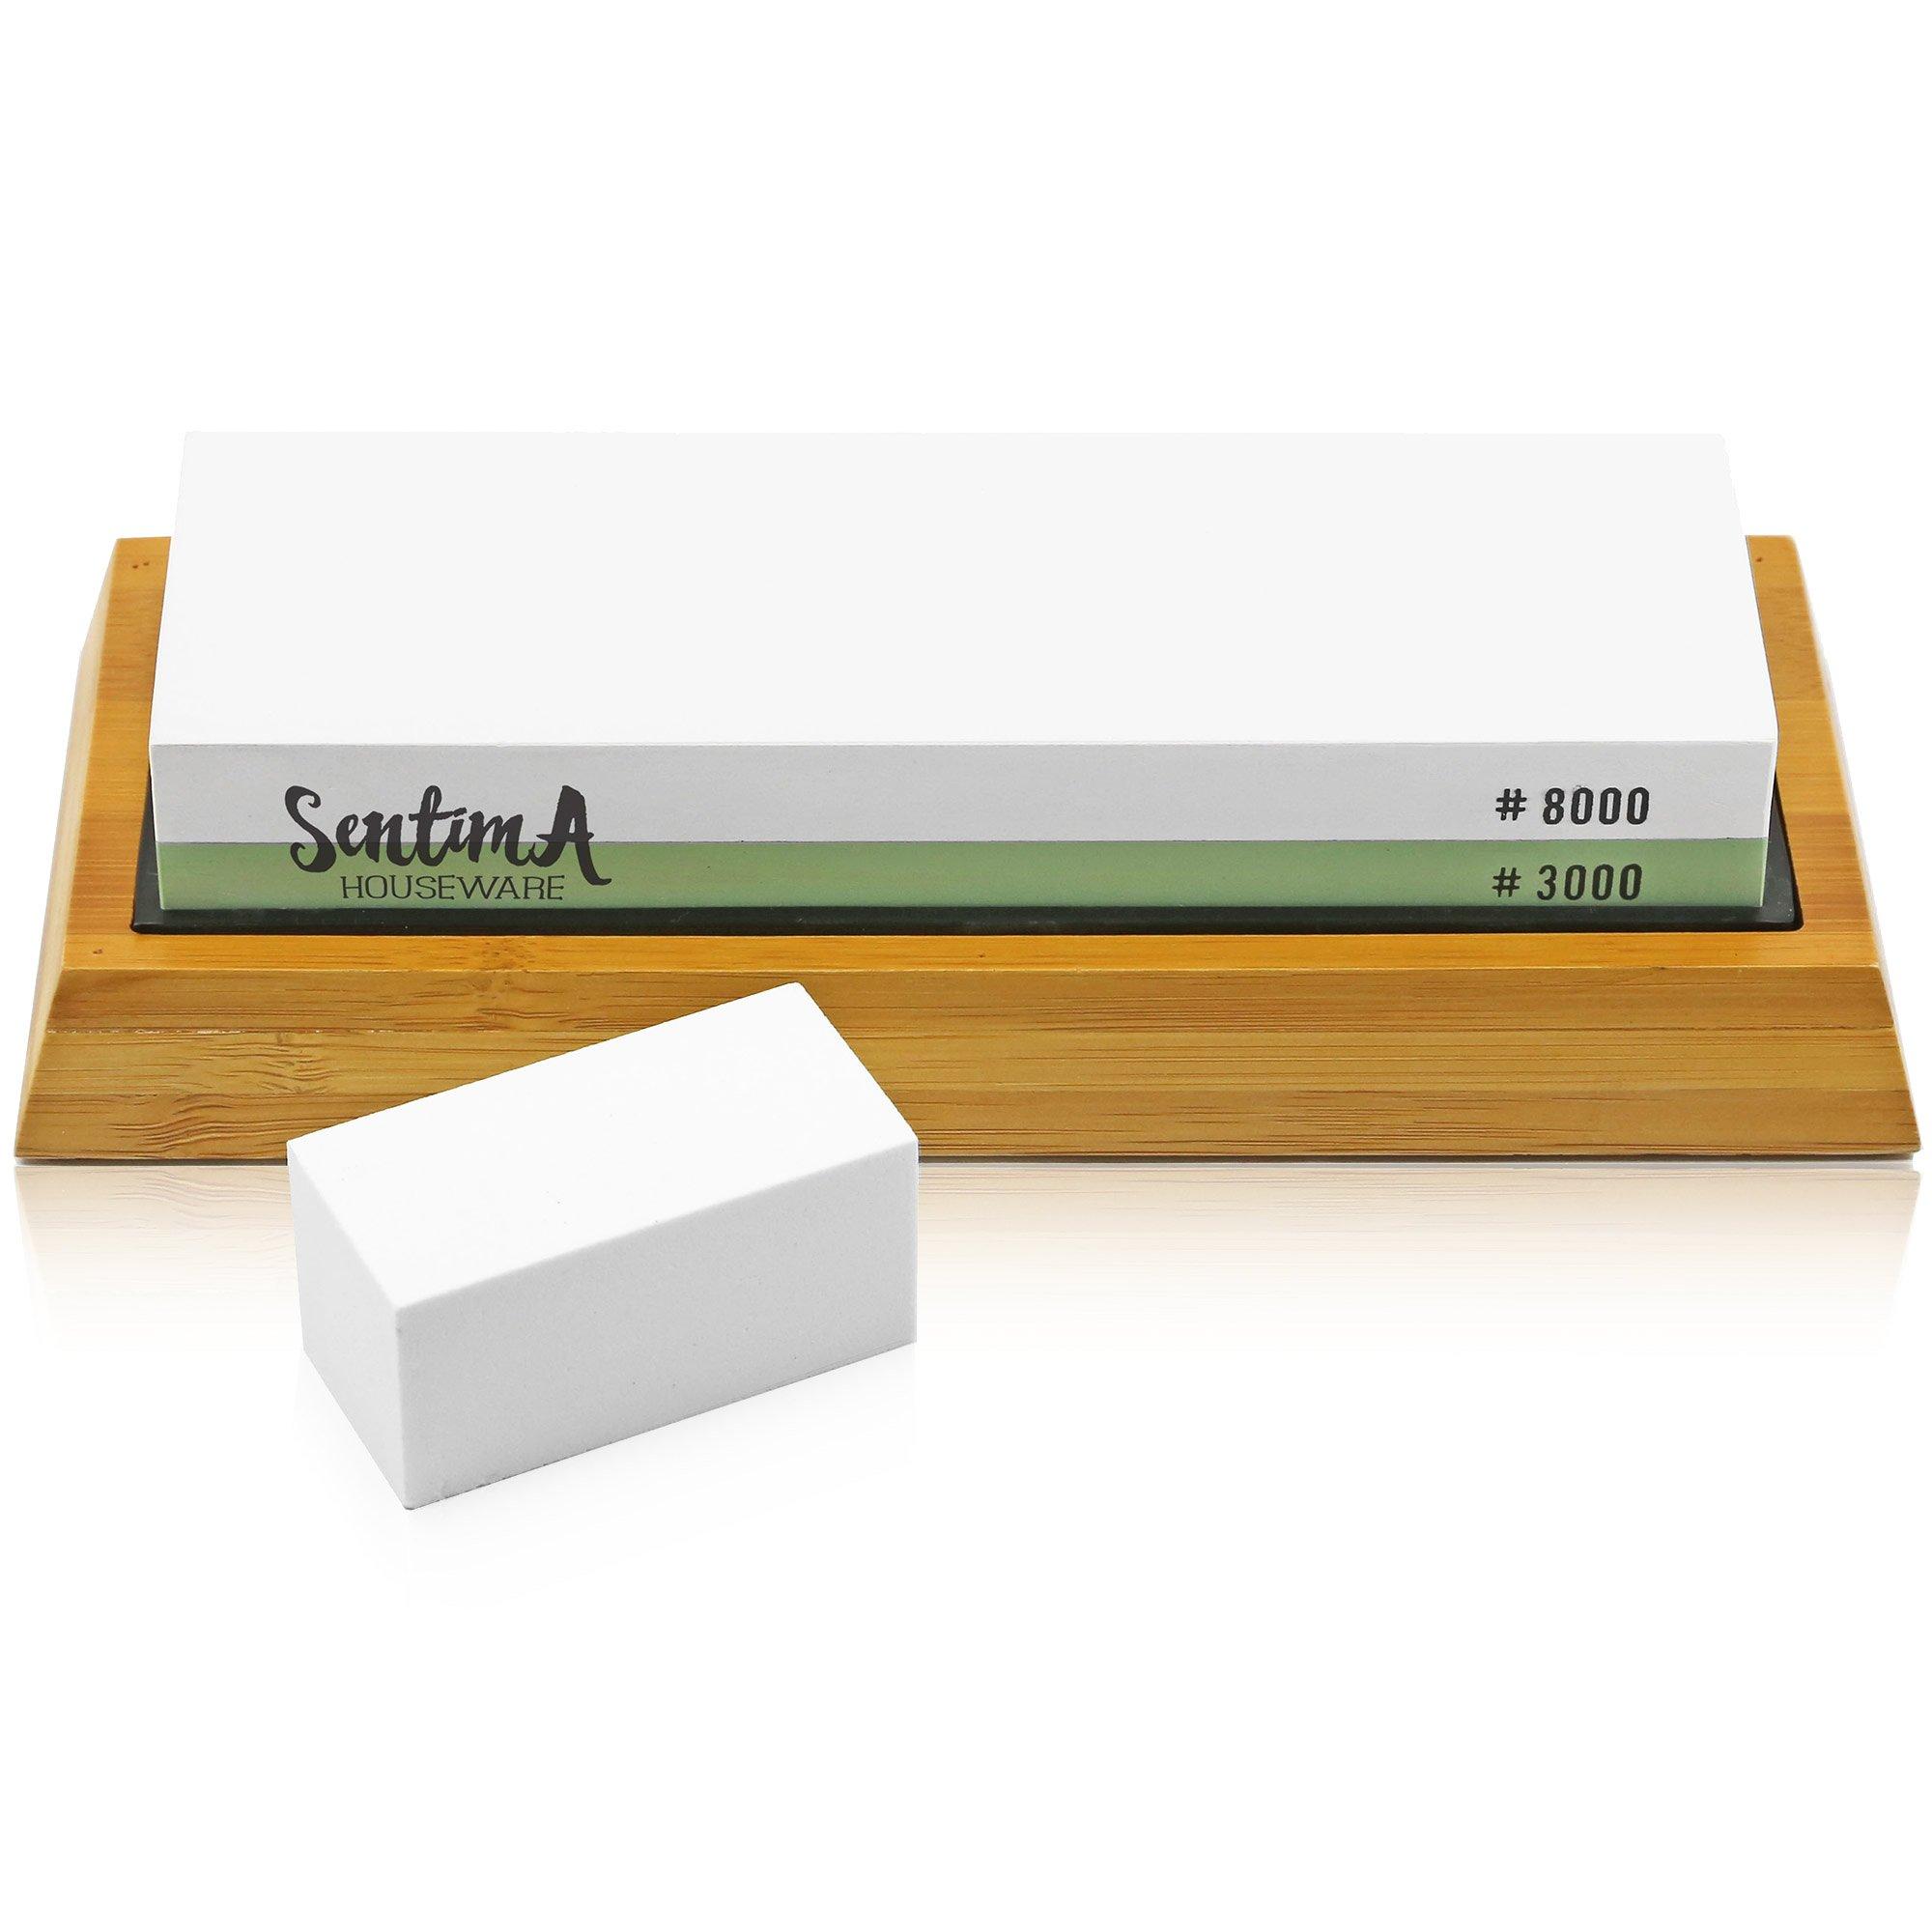 Premium Whetstone Knife Sharpener - 3000/8000 Grit Two Sided Wet Sharpening Stone - Bamboo Base & Flattening Stone